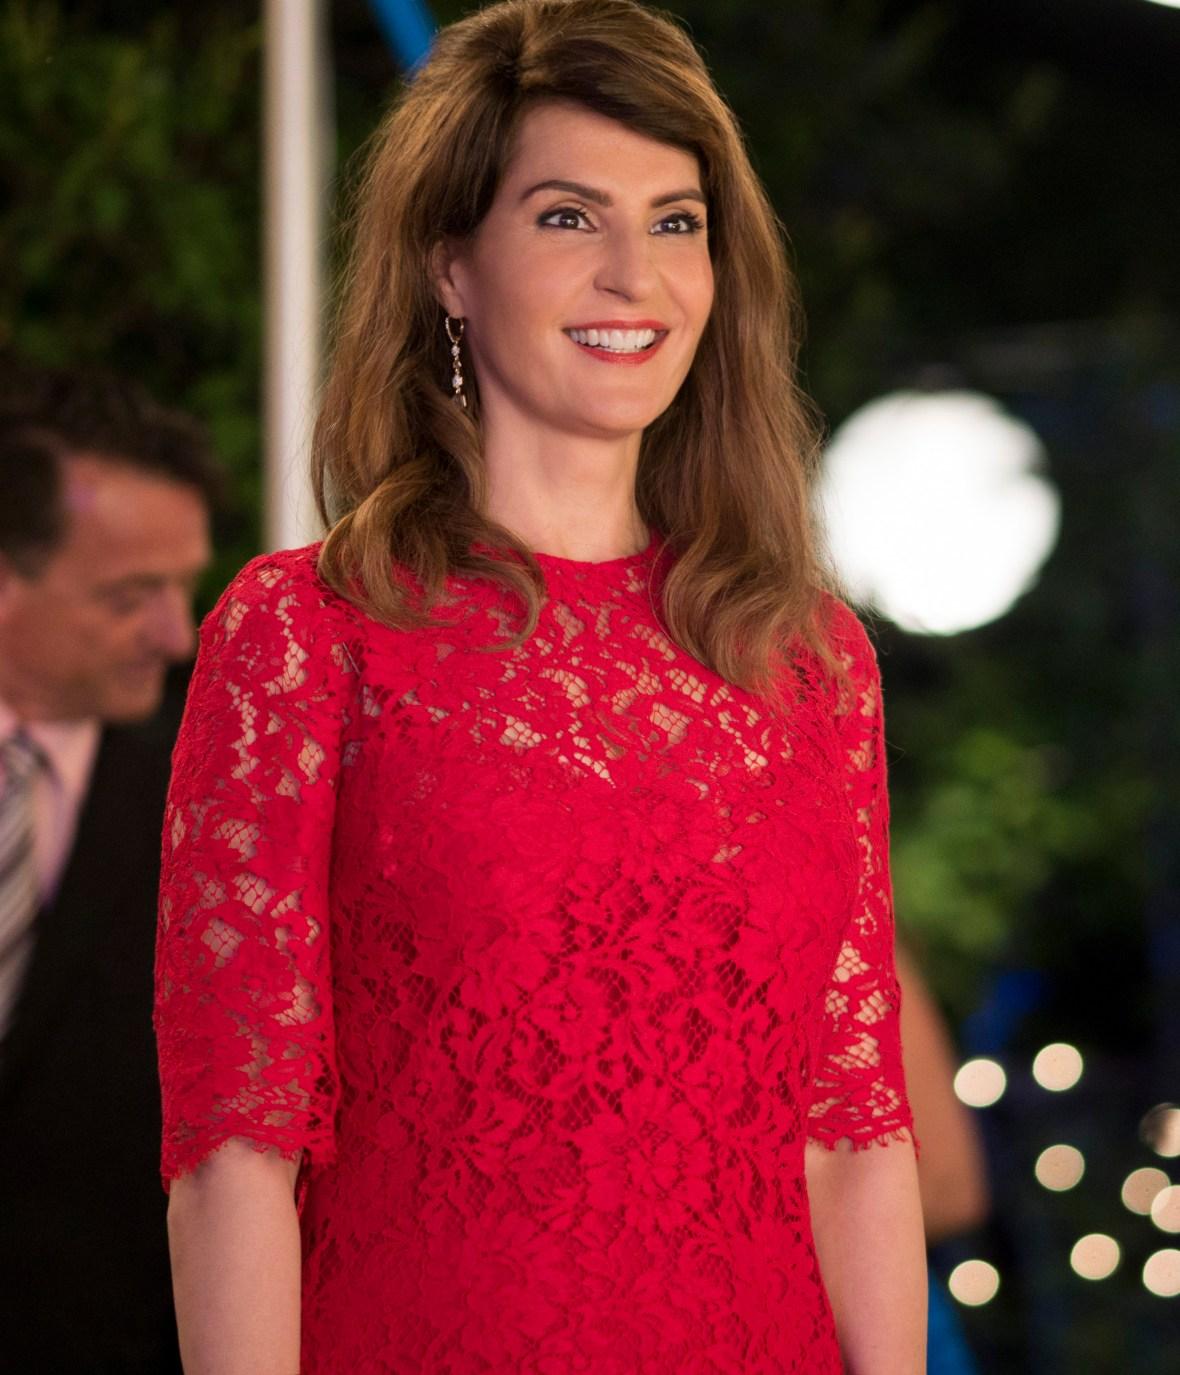 Real Greek Weddings: Nia Vardalos Talks My Big Fat Greek Wedding 2